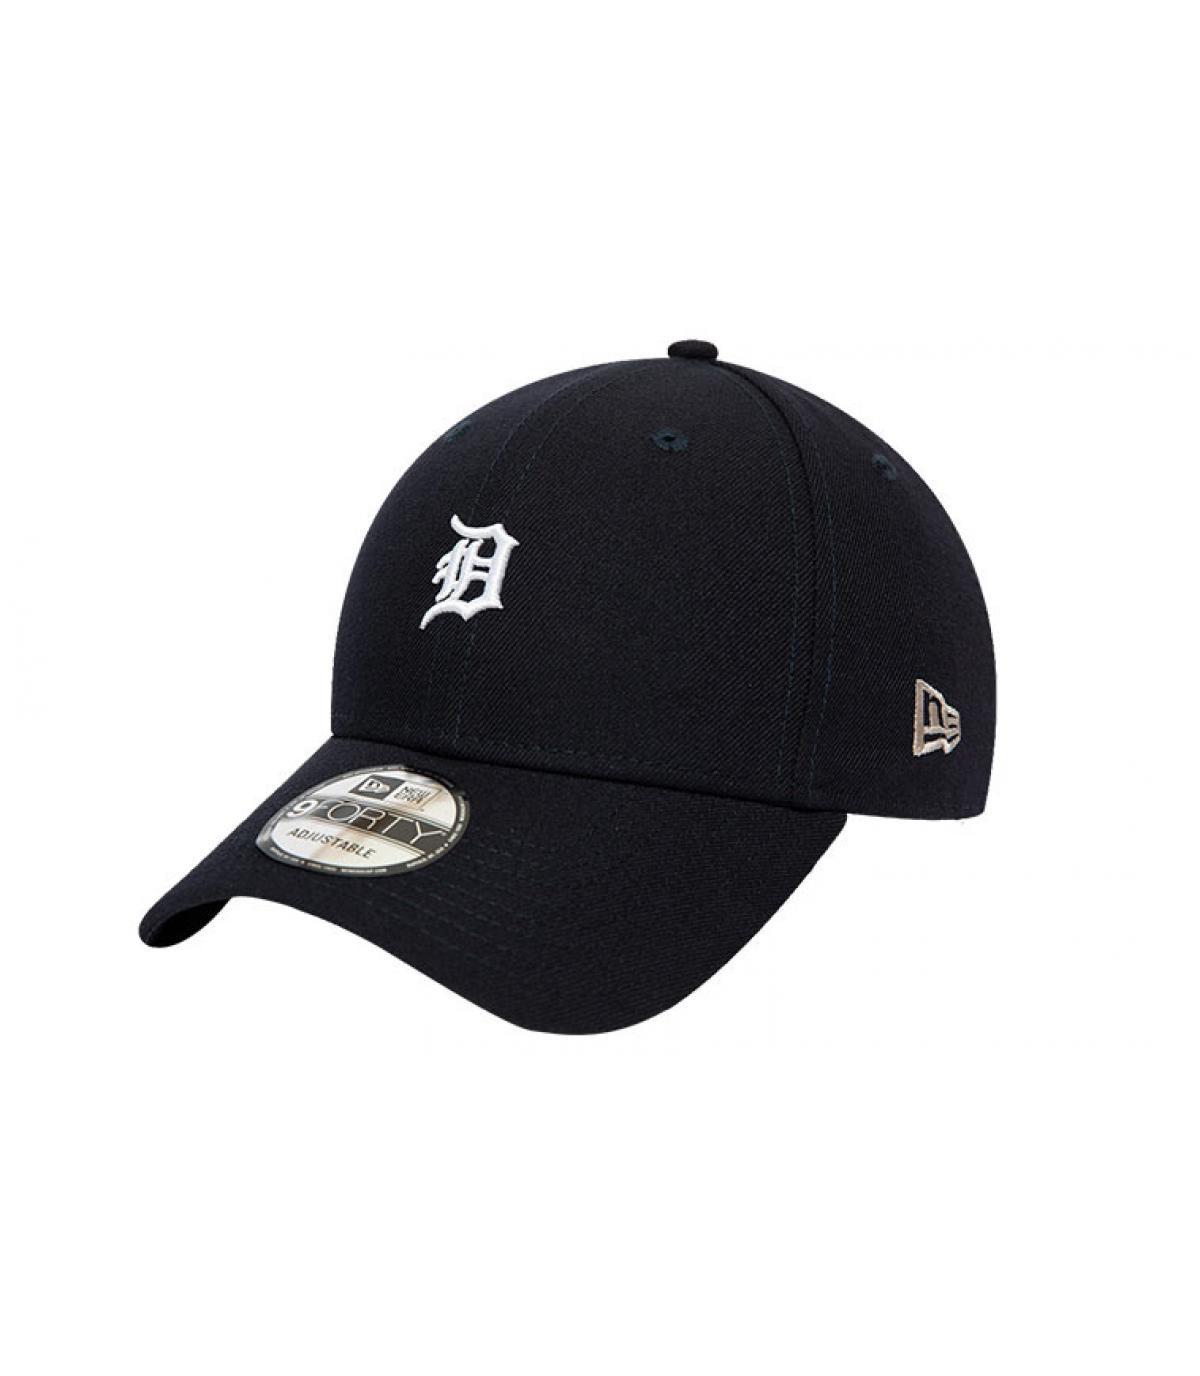 Details Cap MLB Tour Detroit 940 navy - Abbildung 2